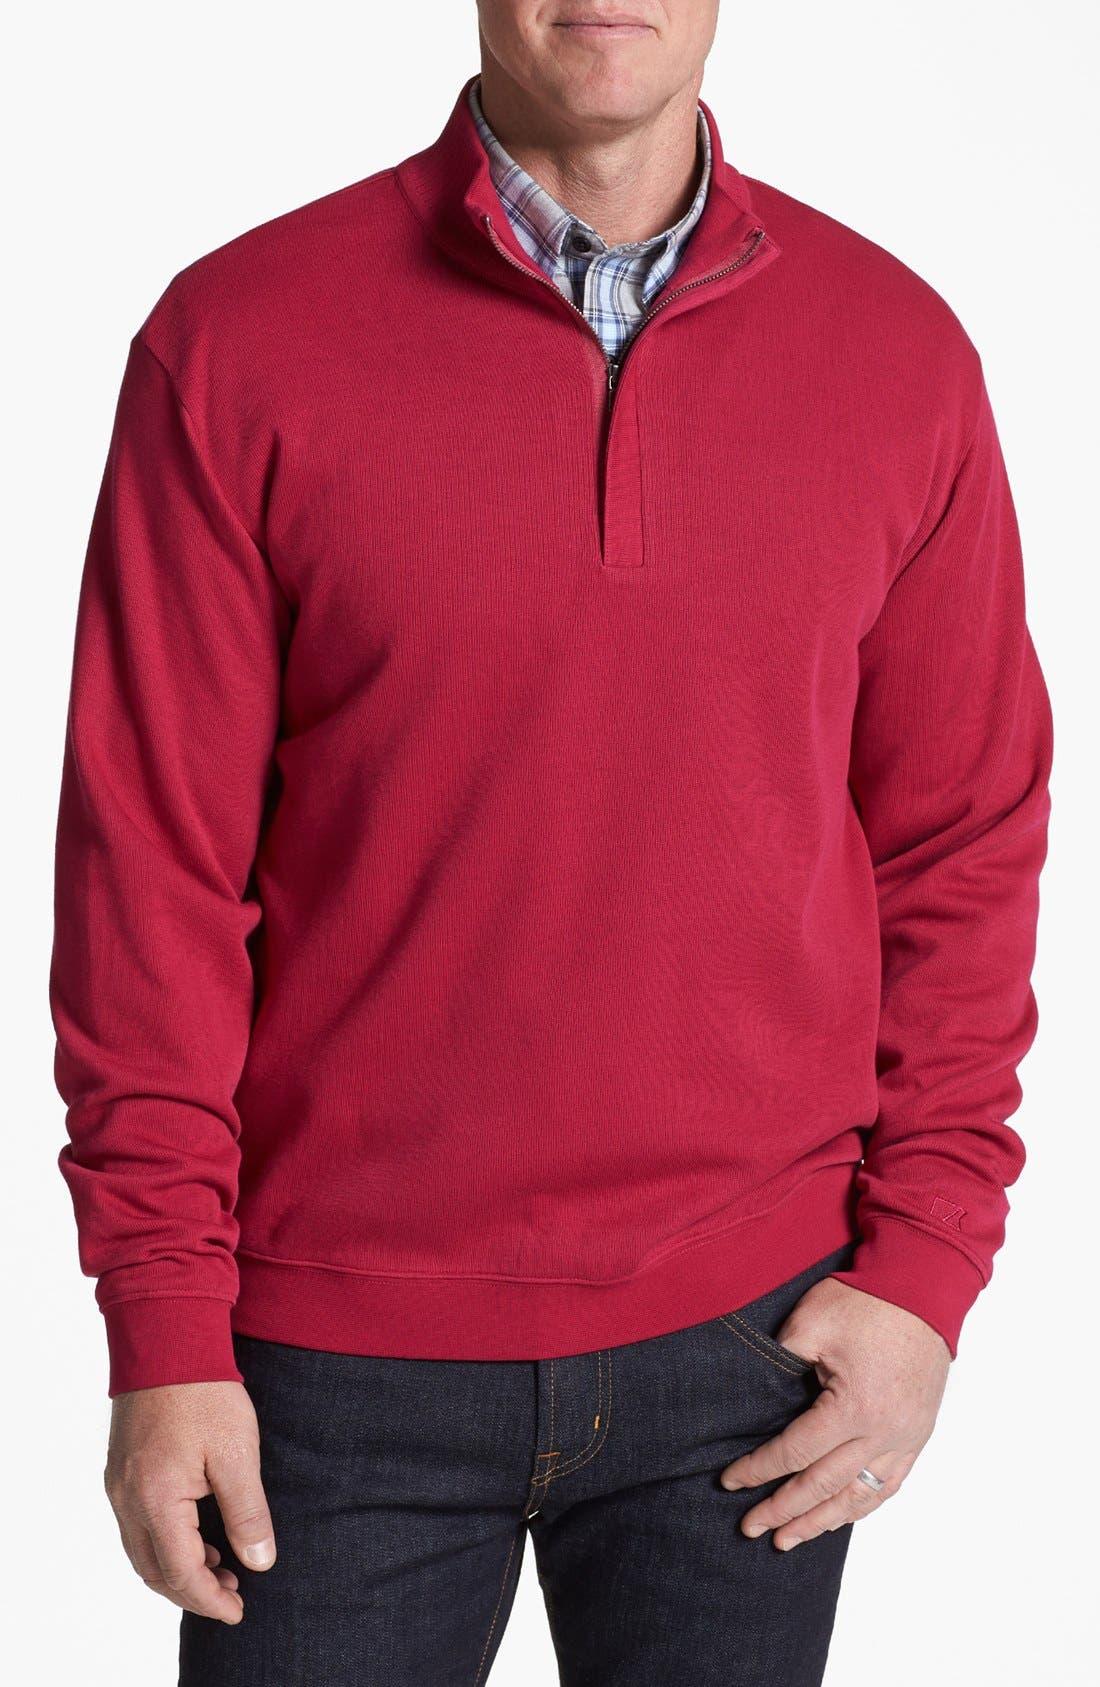 Alternate Image 1 Selected - Cutter & Buck 'Flatback' Pullover Sweatshirt (Big & Tall)